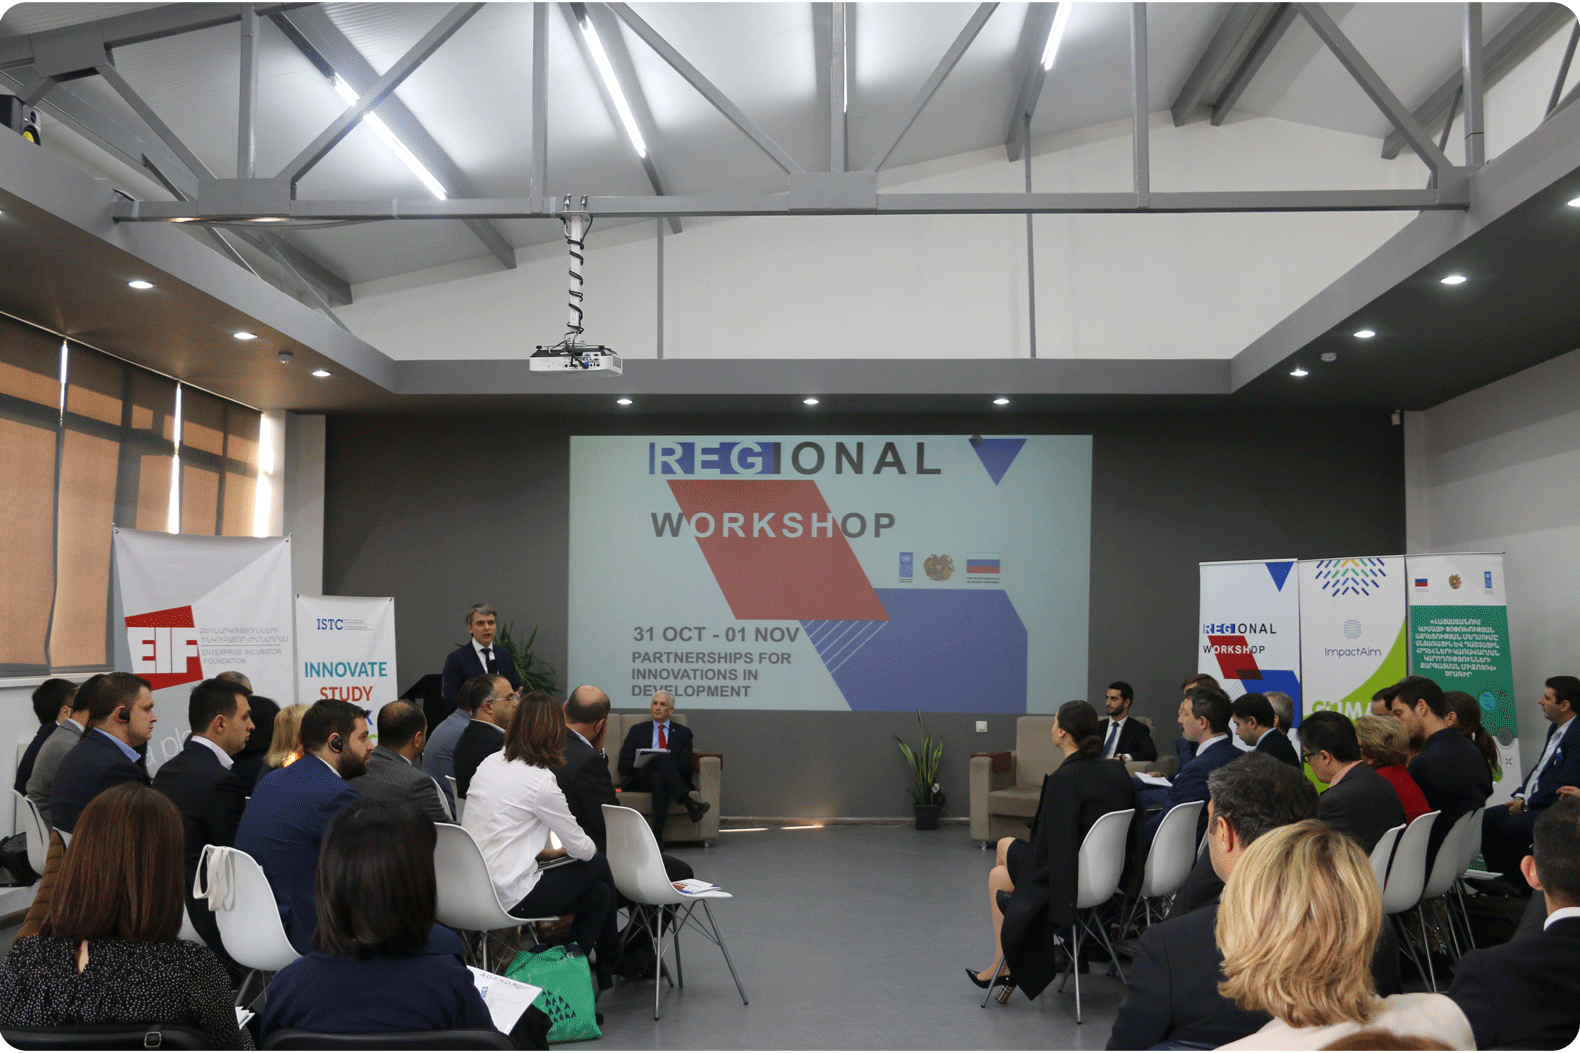 """Partnerships for Innovations in Development"" regional workshop"